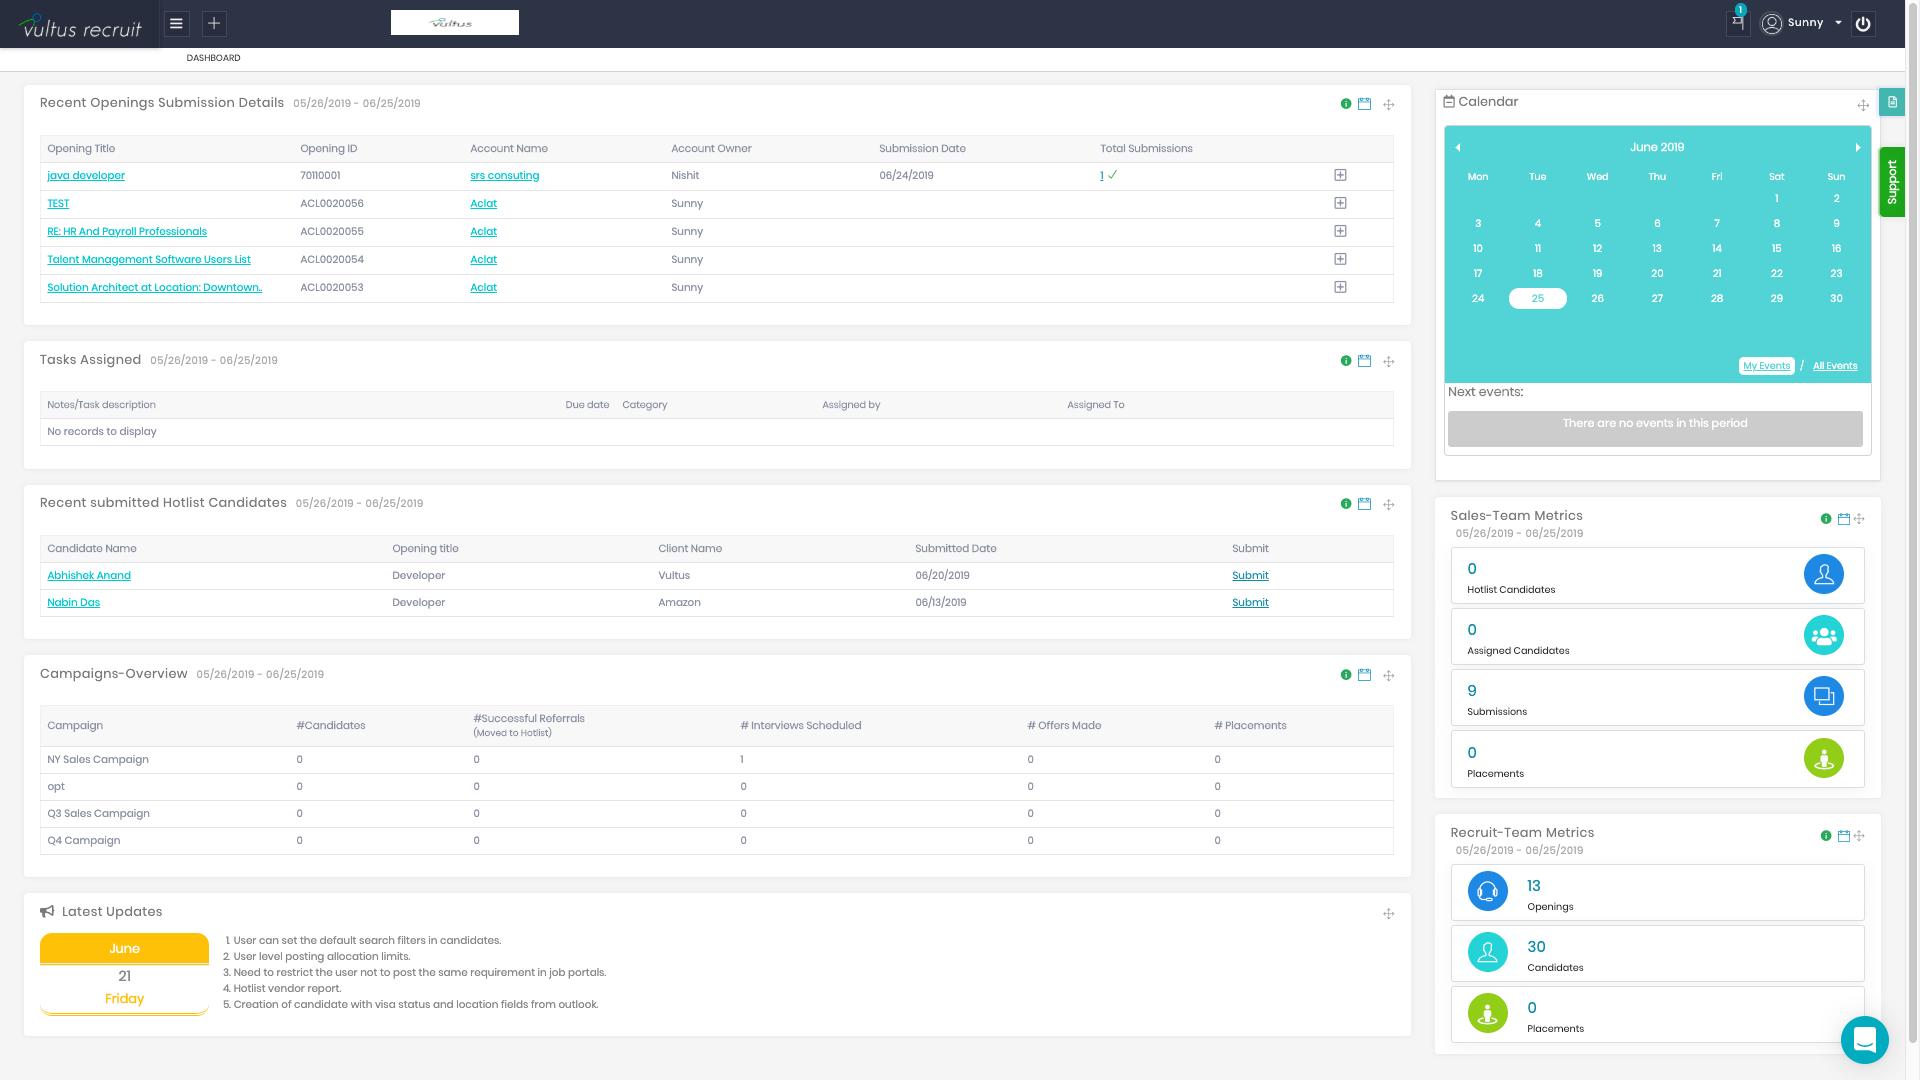 Vultus Recruit screenshot: Vultus Recruit dashboard screenshot